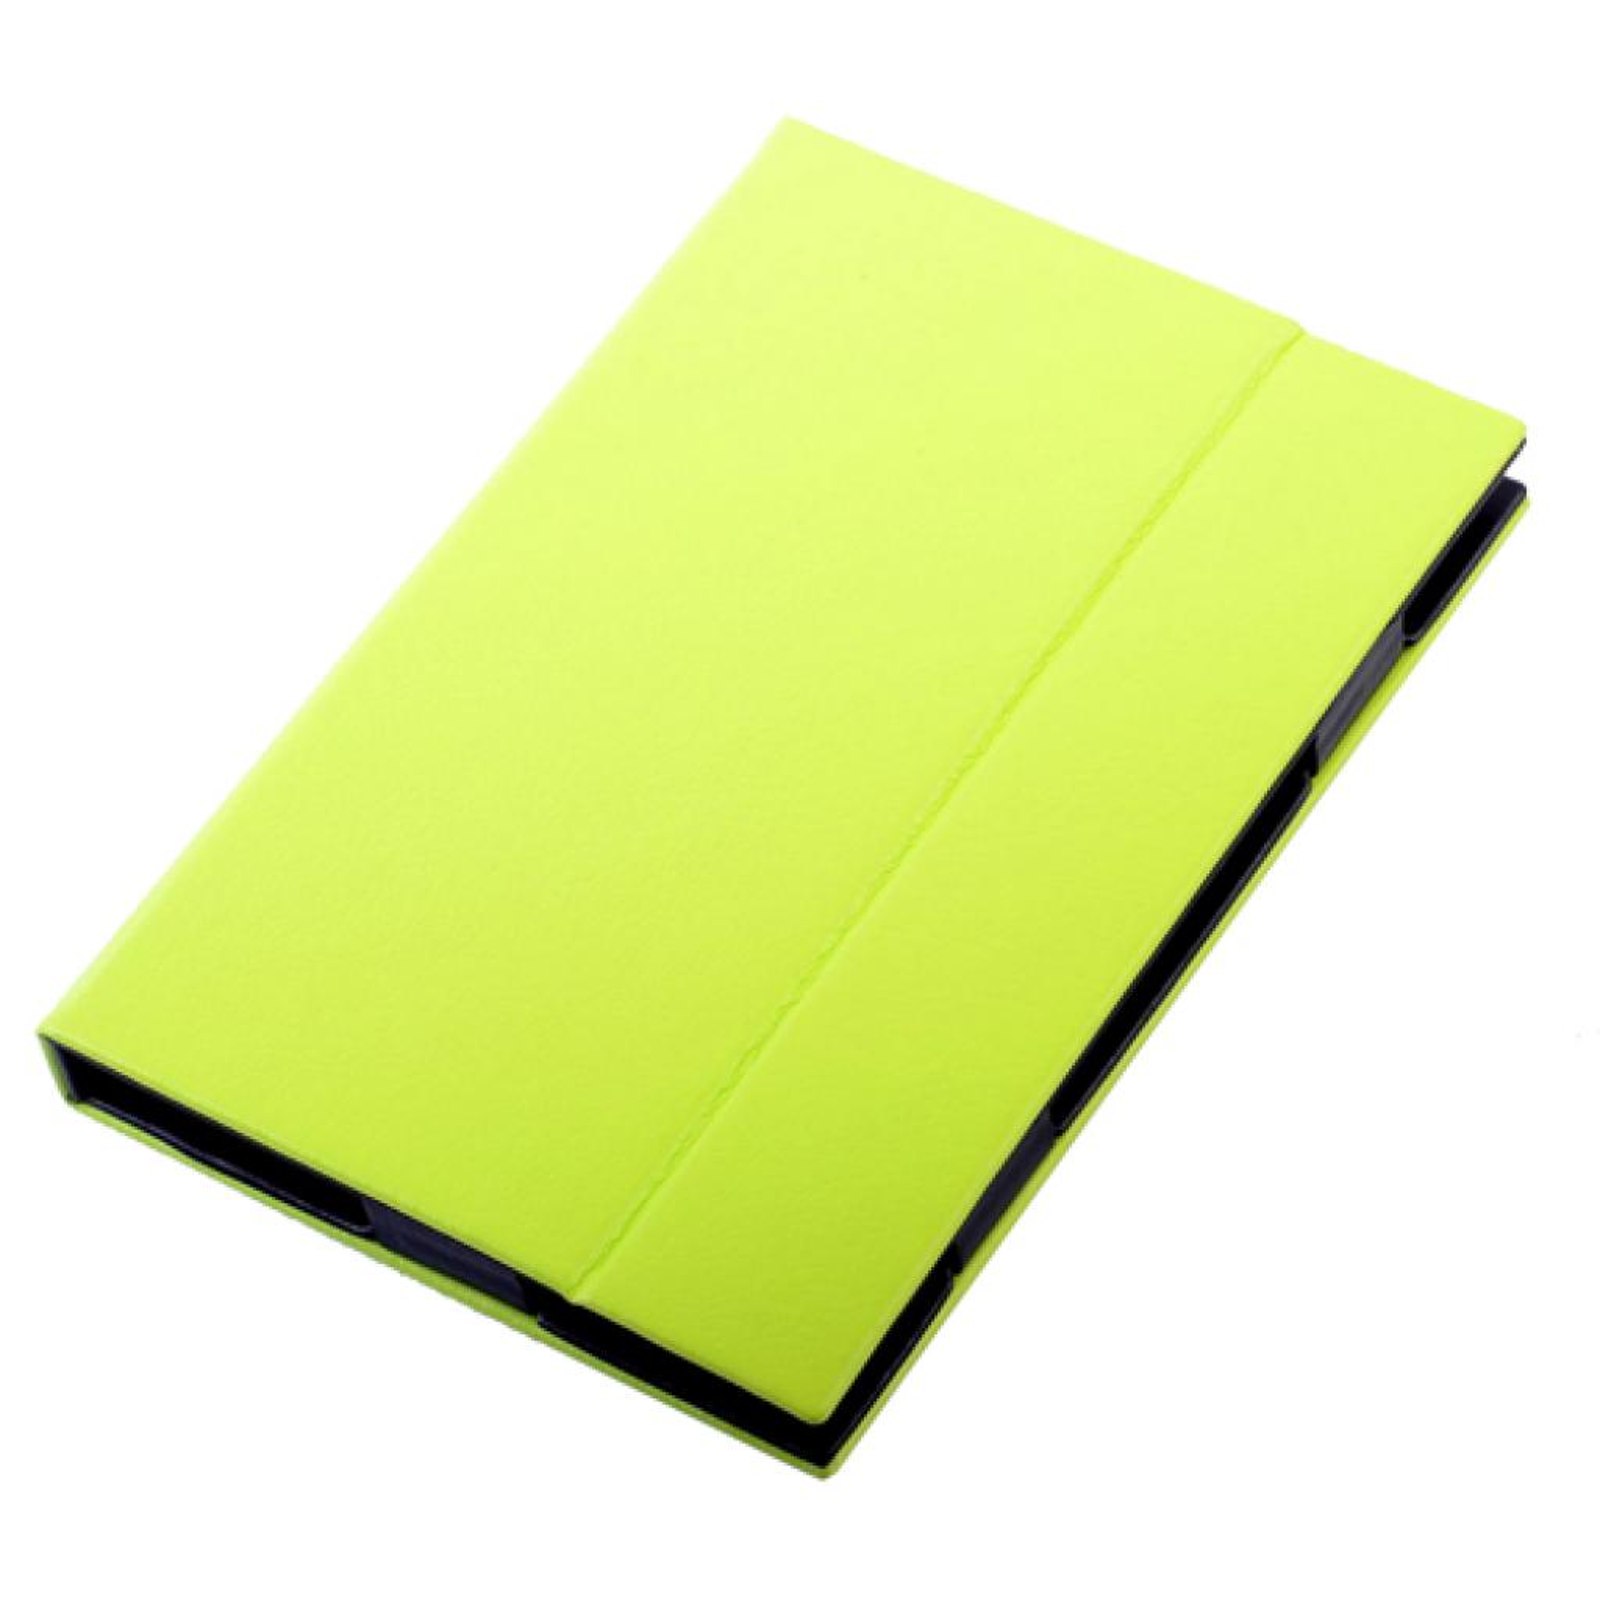 Чехол для планшета Vento 7 Desire Bright - lime